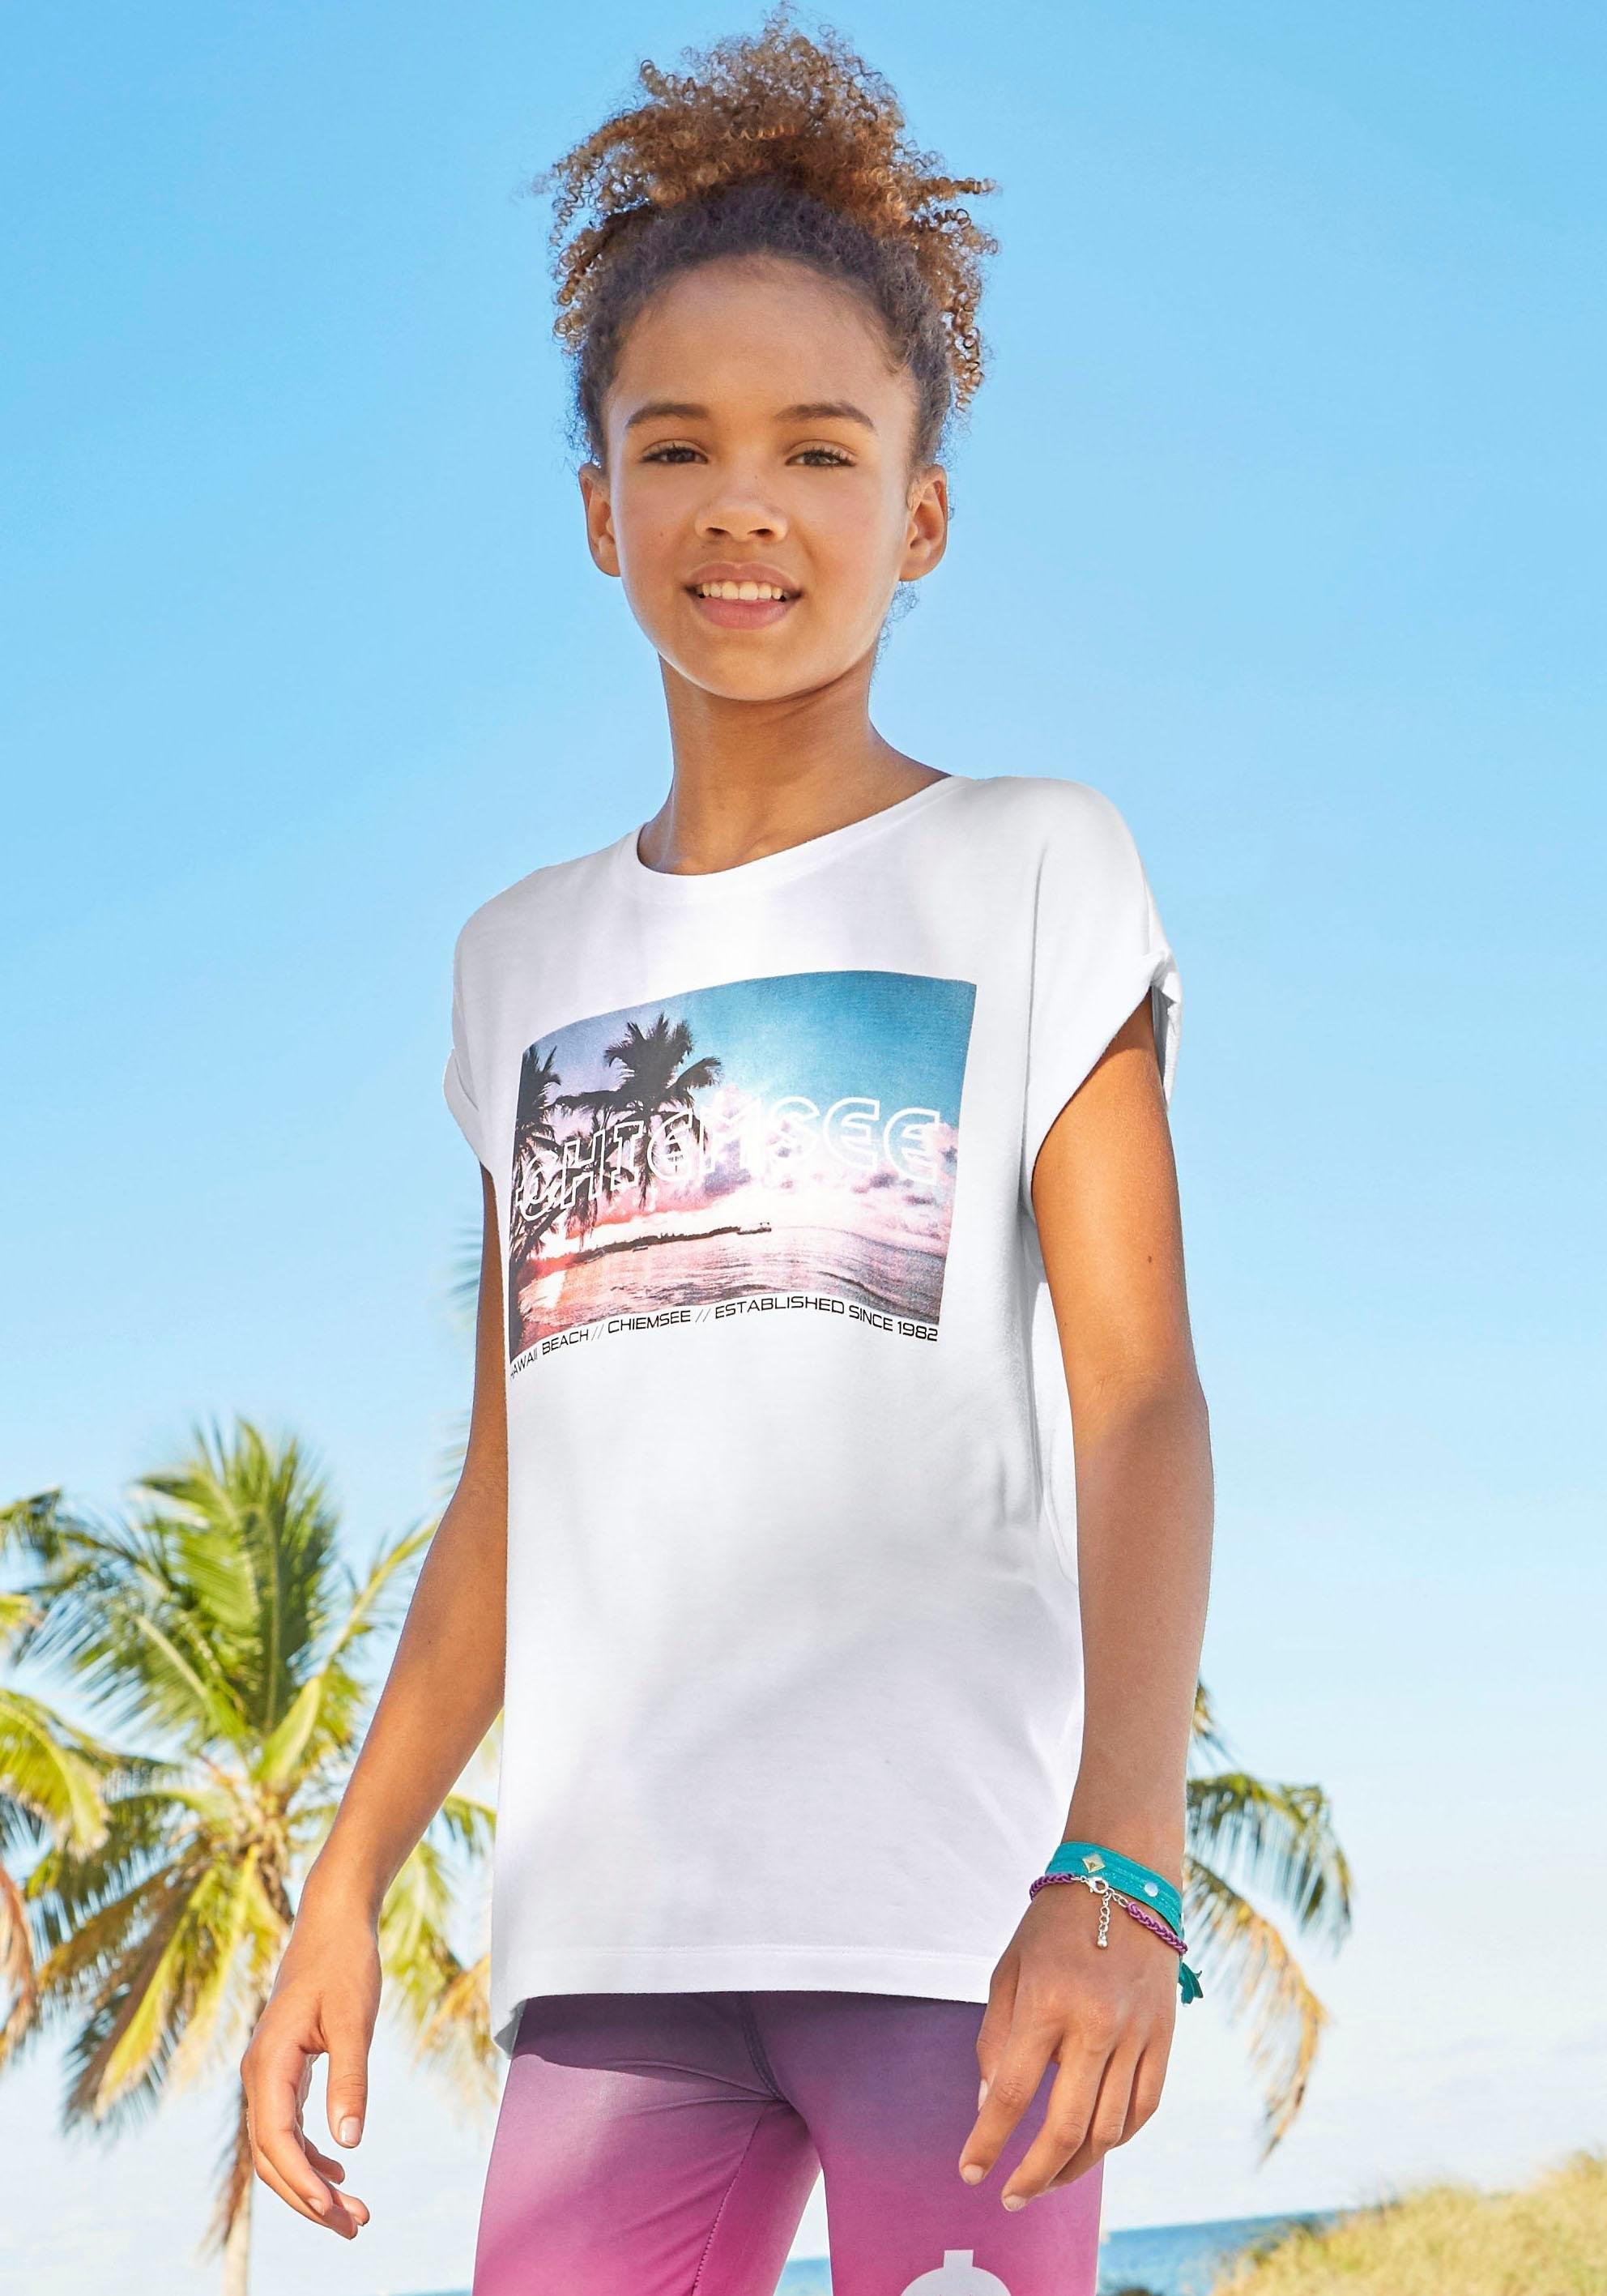 bf24d543270 ... Nike Sportswear trainingsshirt »Novelty«, adidas Performance  trainingsshirt »YOUNG GIRL TRAINING EQUIPMENT TEE«, PUMA T-shirt »ESSENTIAL  TEE GIRLS«, ...